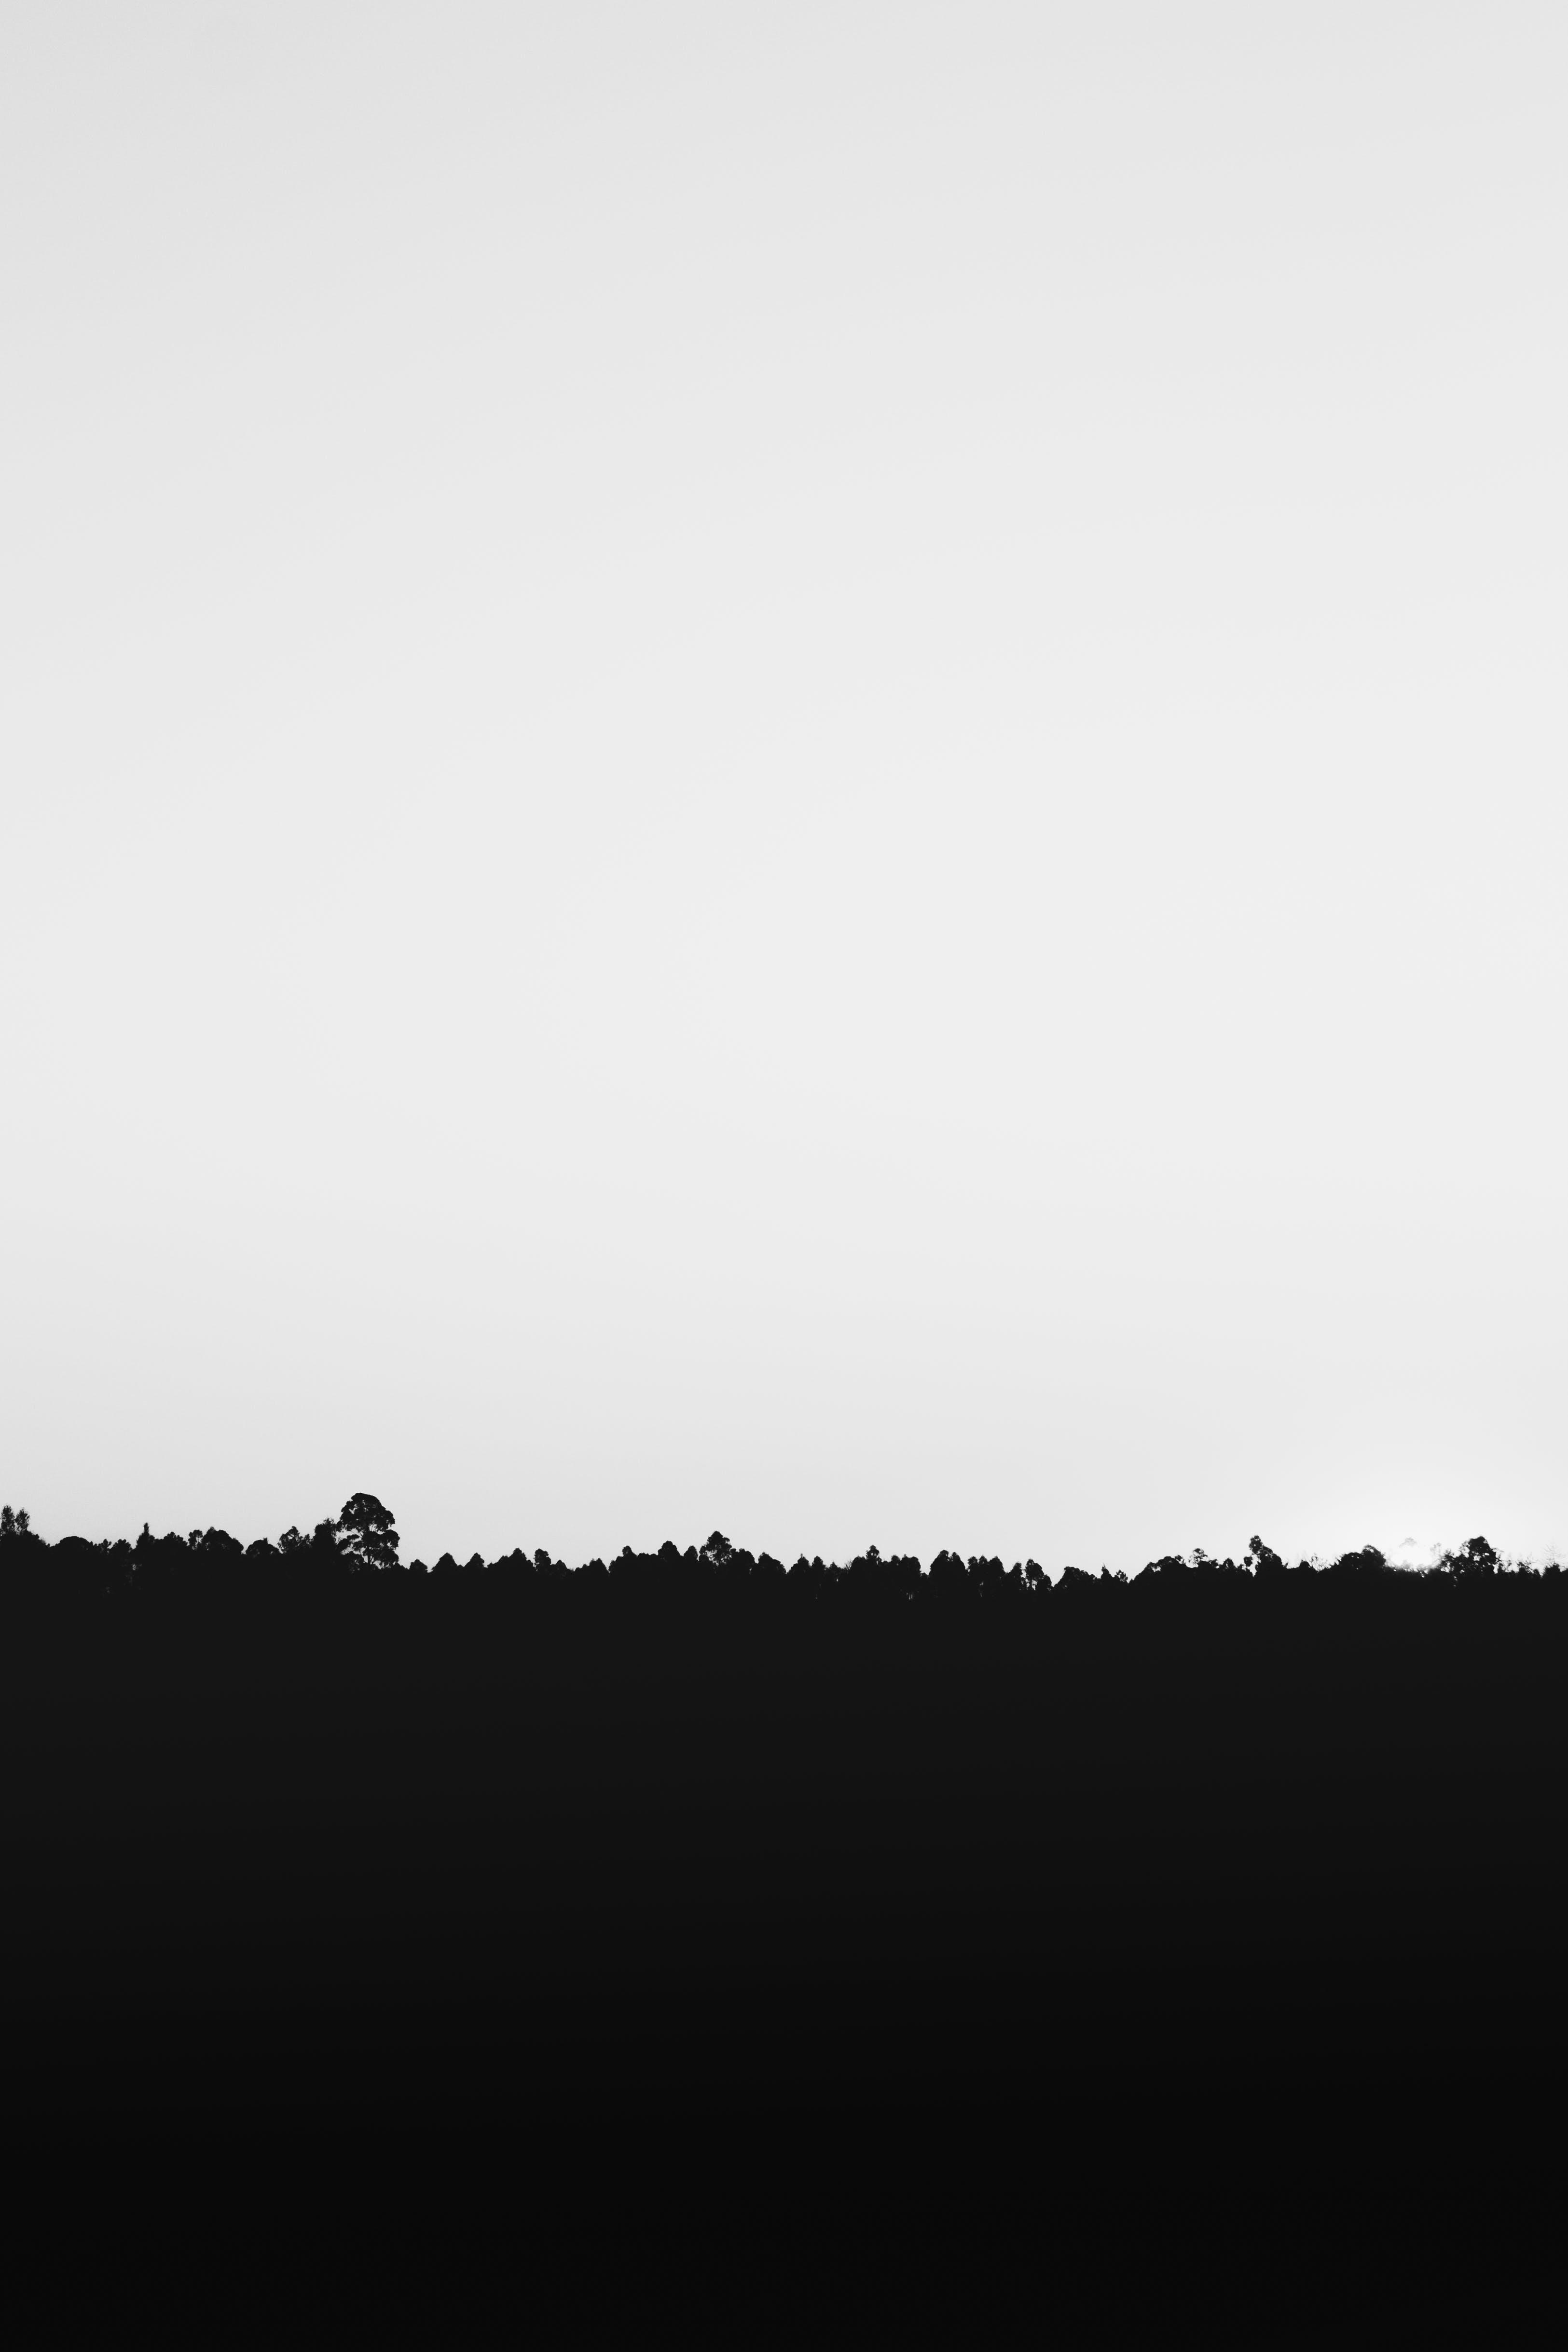 Silhouette of Grass Under White Sky